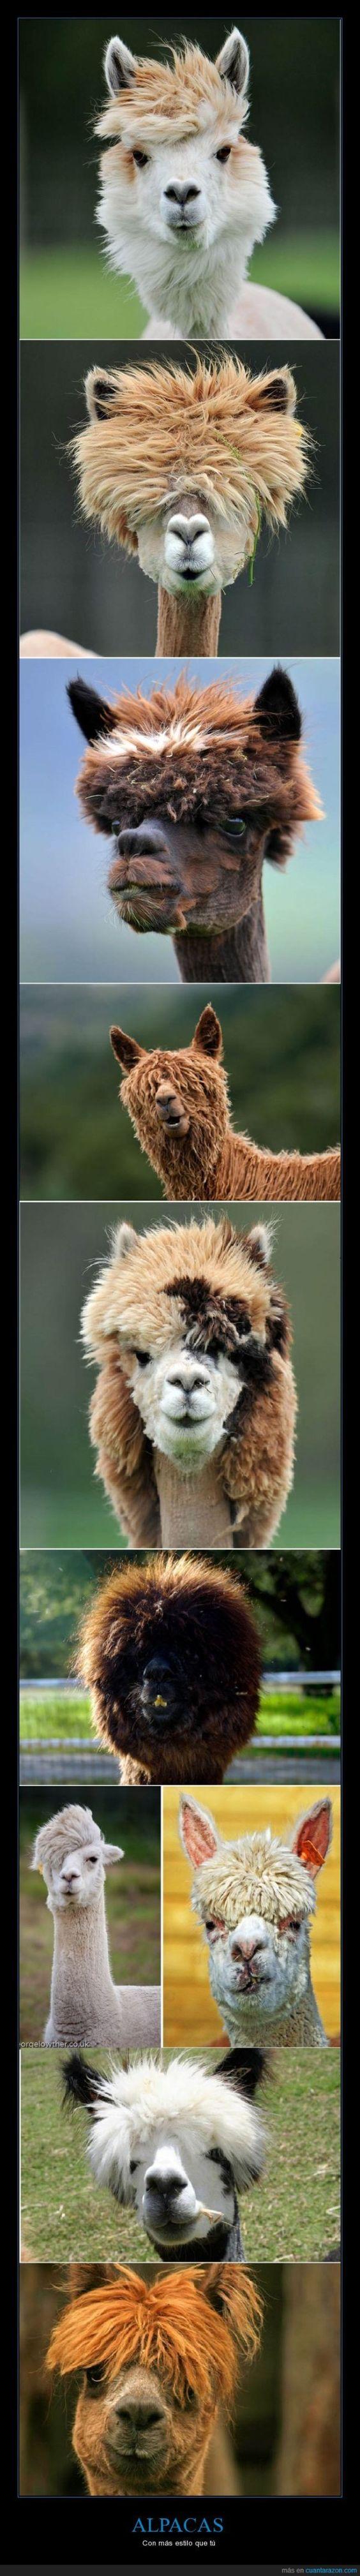 memes de animales chistosos112 100 Memes de Animales Graciosos